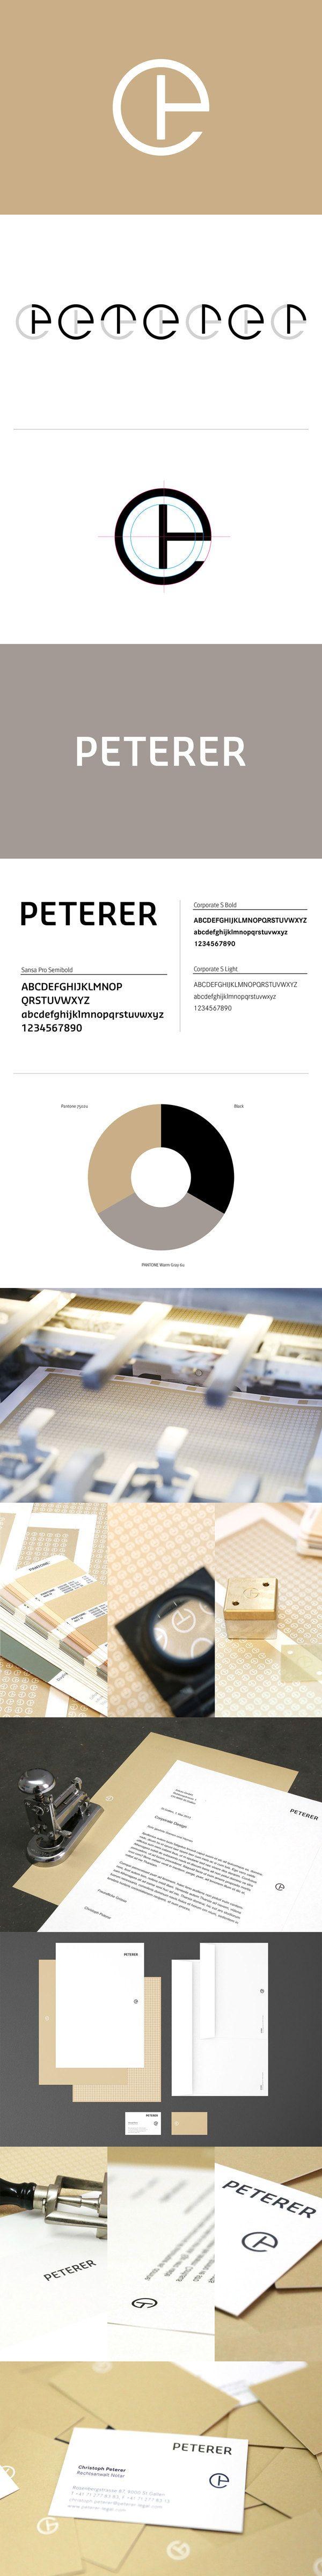 Peterer Lawyer // Corporate Design by Adicto Multichannel Agency , via Behance